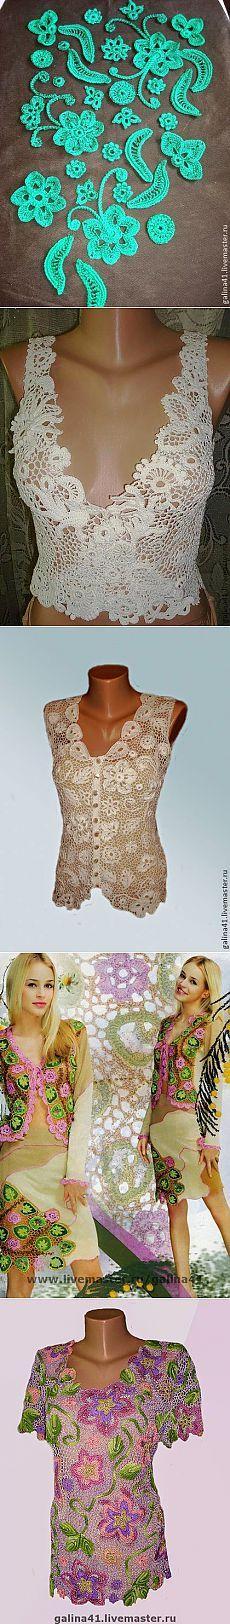 Irish crochet &: Мастер Галина Андриенко